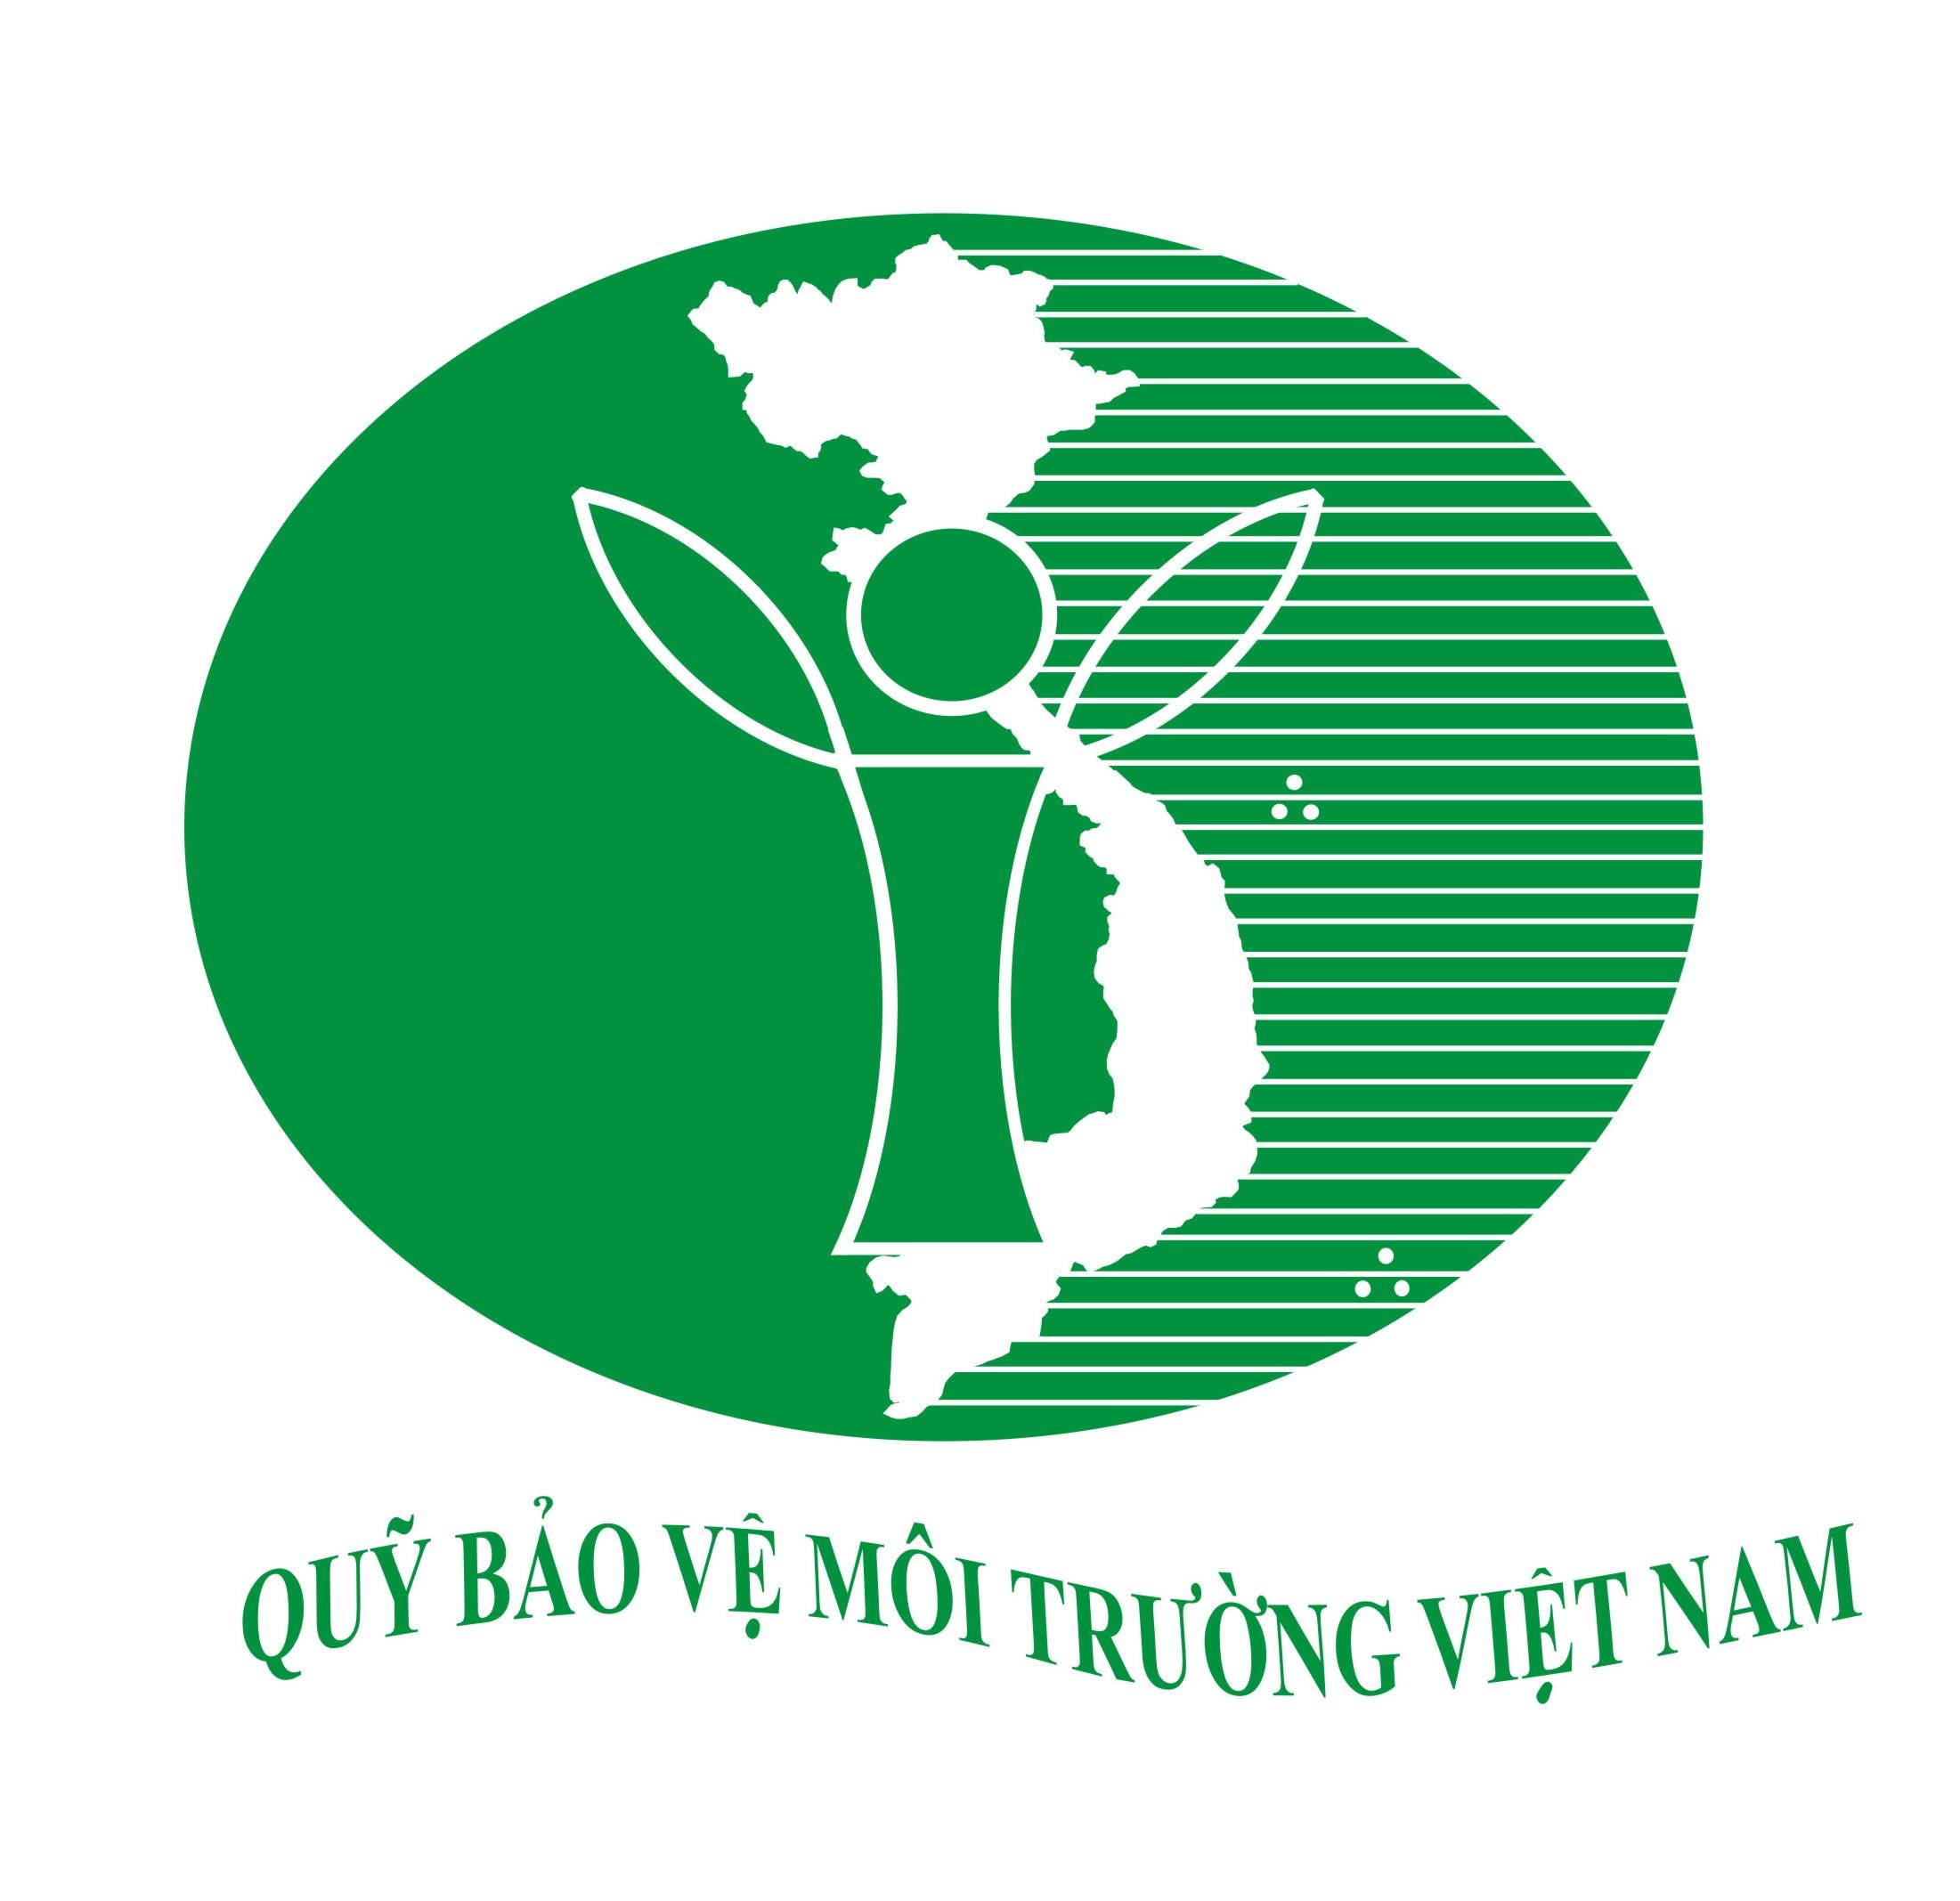 de xuat nang muc von dieu le cua quy bao ve moi truong viet nam